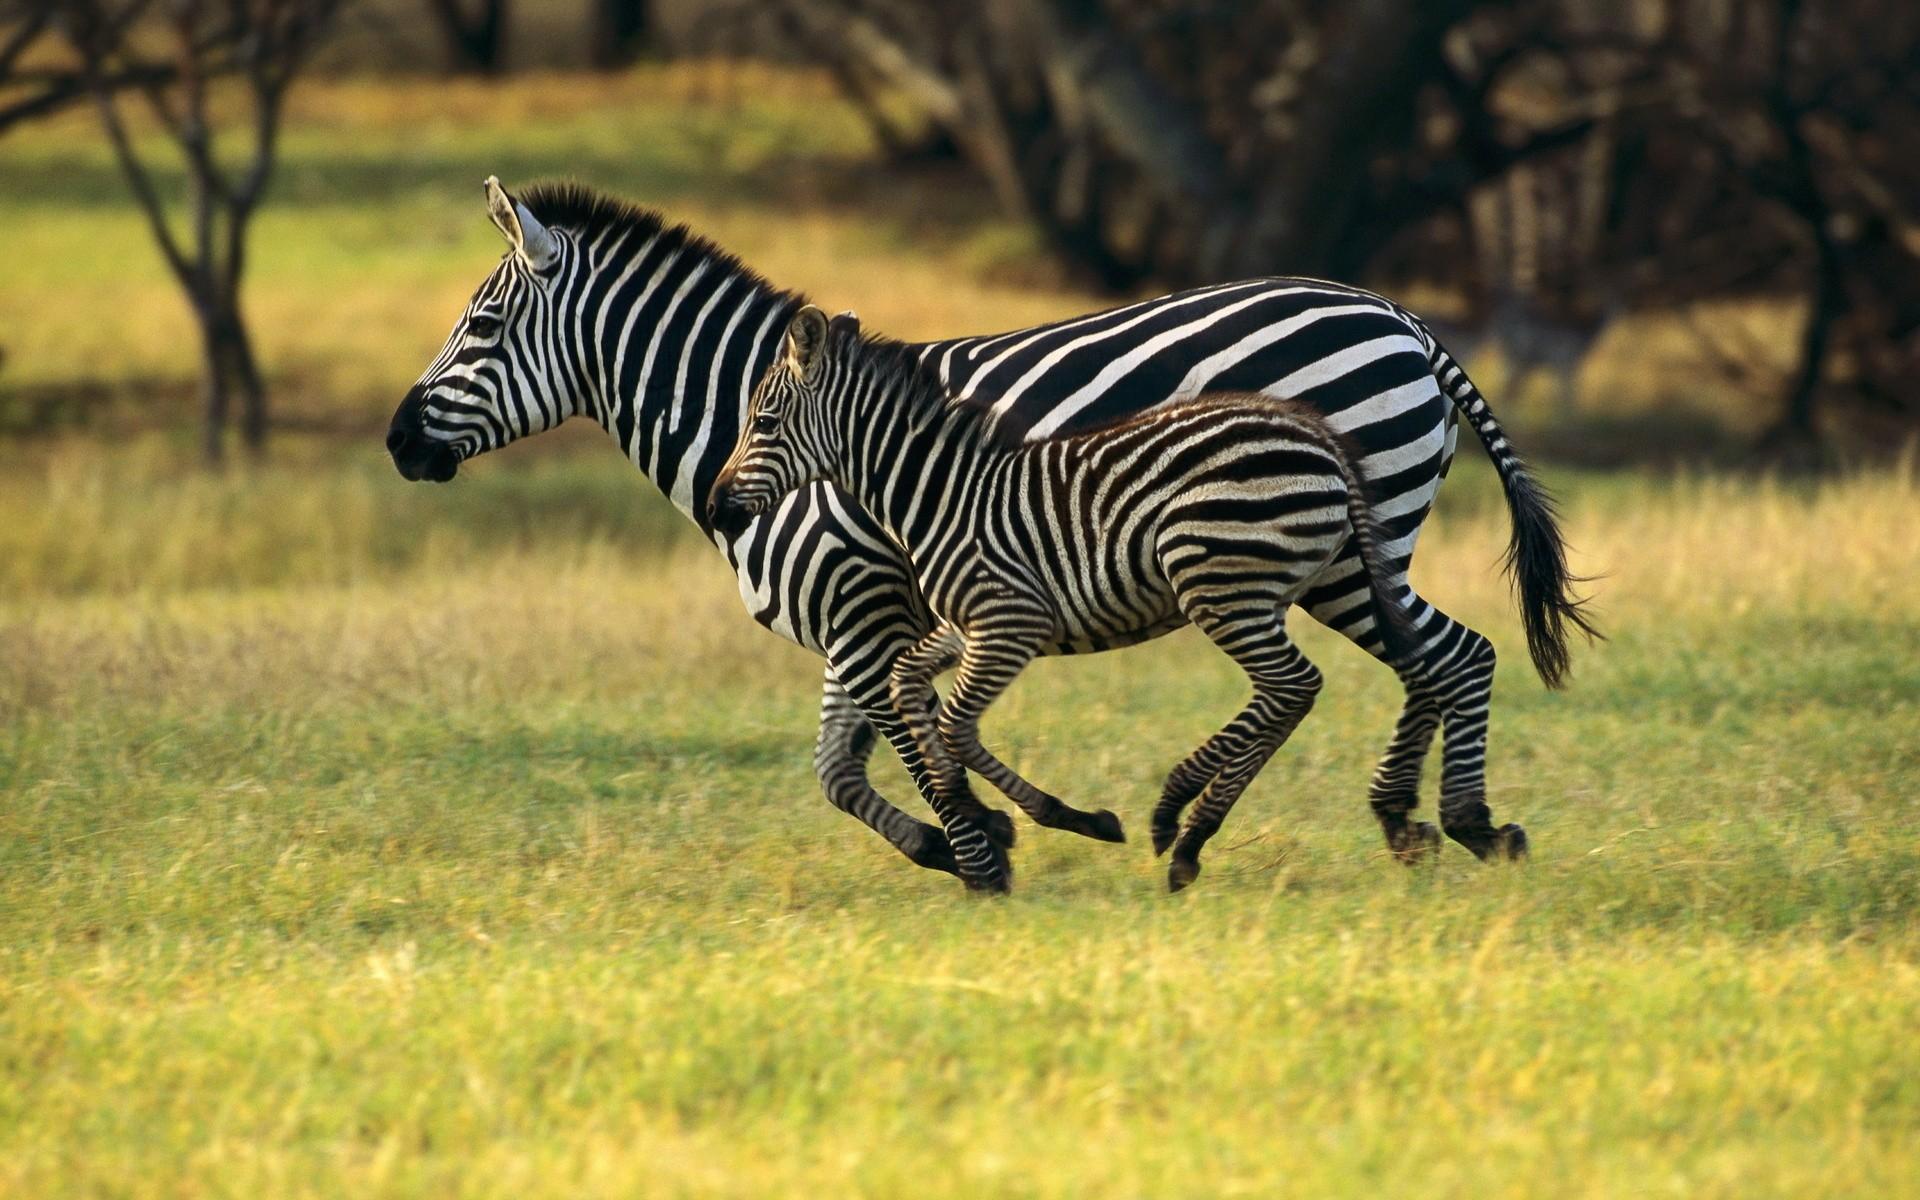 http://www.zastavki.com/pictures/originals/2014/Animals___Wild_artiodactyls_____Zebra_with_cub_081873_.jpg